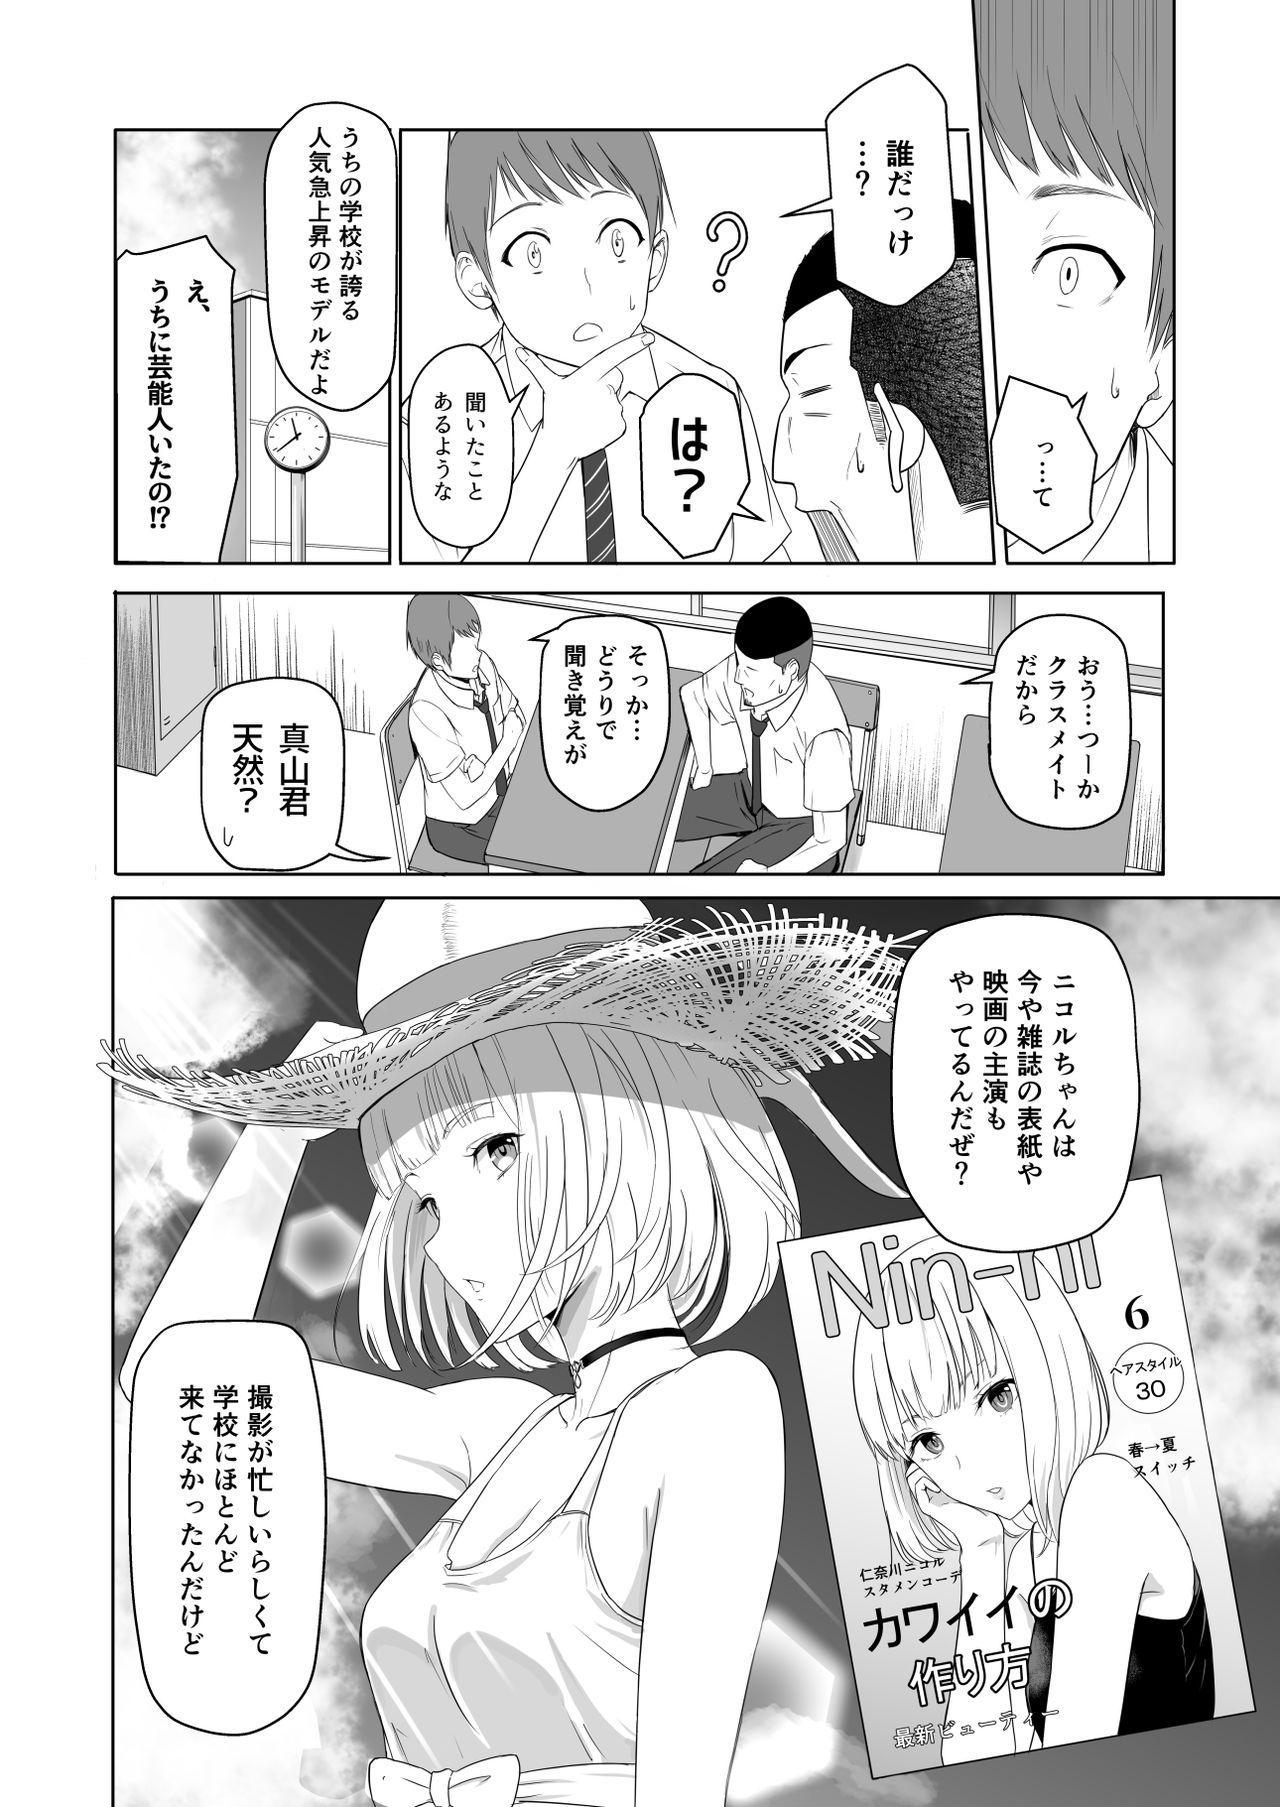 Kimi ga Tame. 2 Ichikawa Inori 6